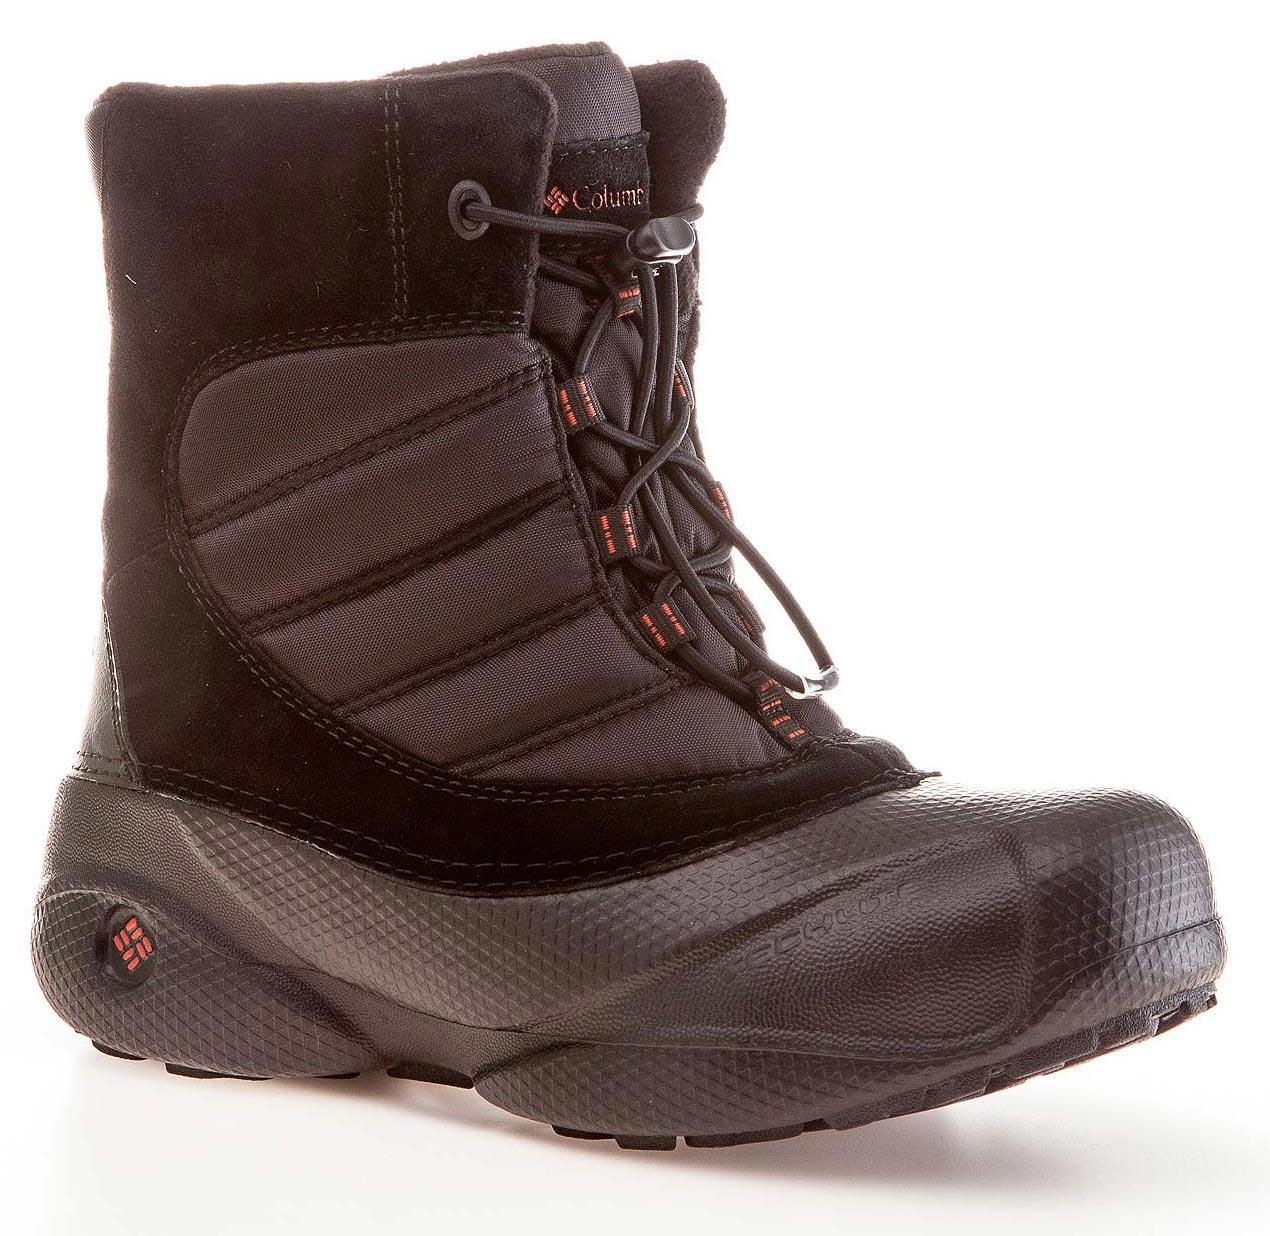 b8a4e69840aaf Columbia YOUTH ROPE TOW JUNIOR. Detská zimná obuv